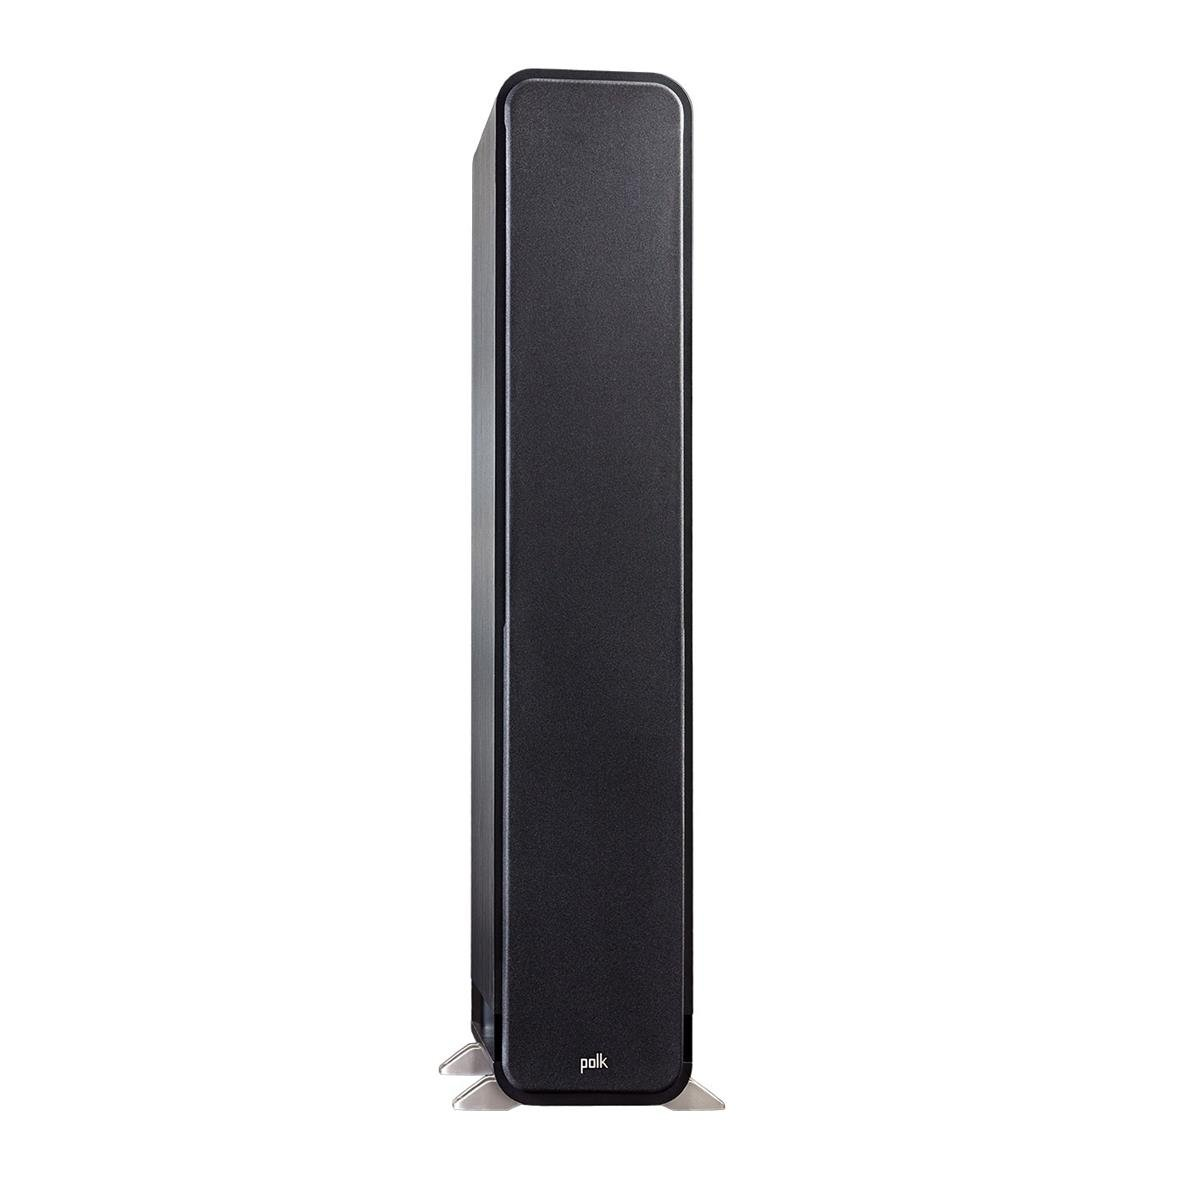 Polk Audio Signature S60 American HiFi Home Theater Tower Speaker (Single, Black) by Polk Audio